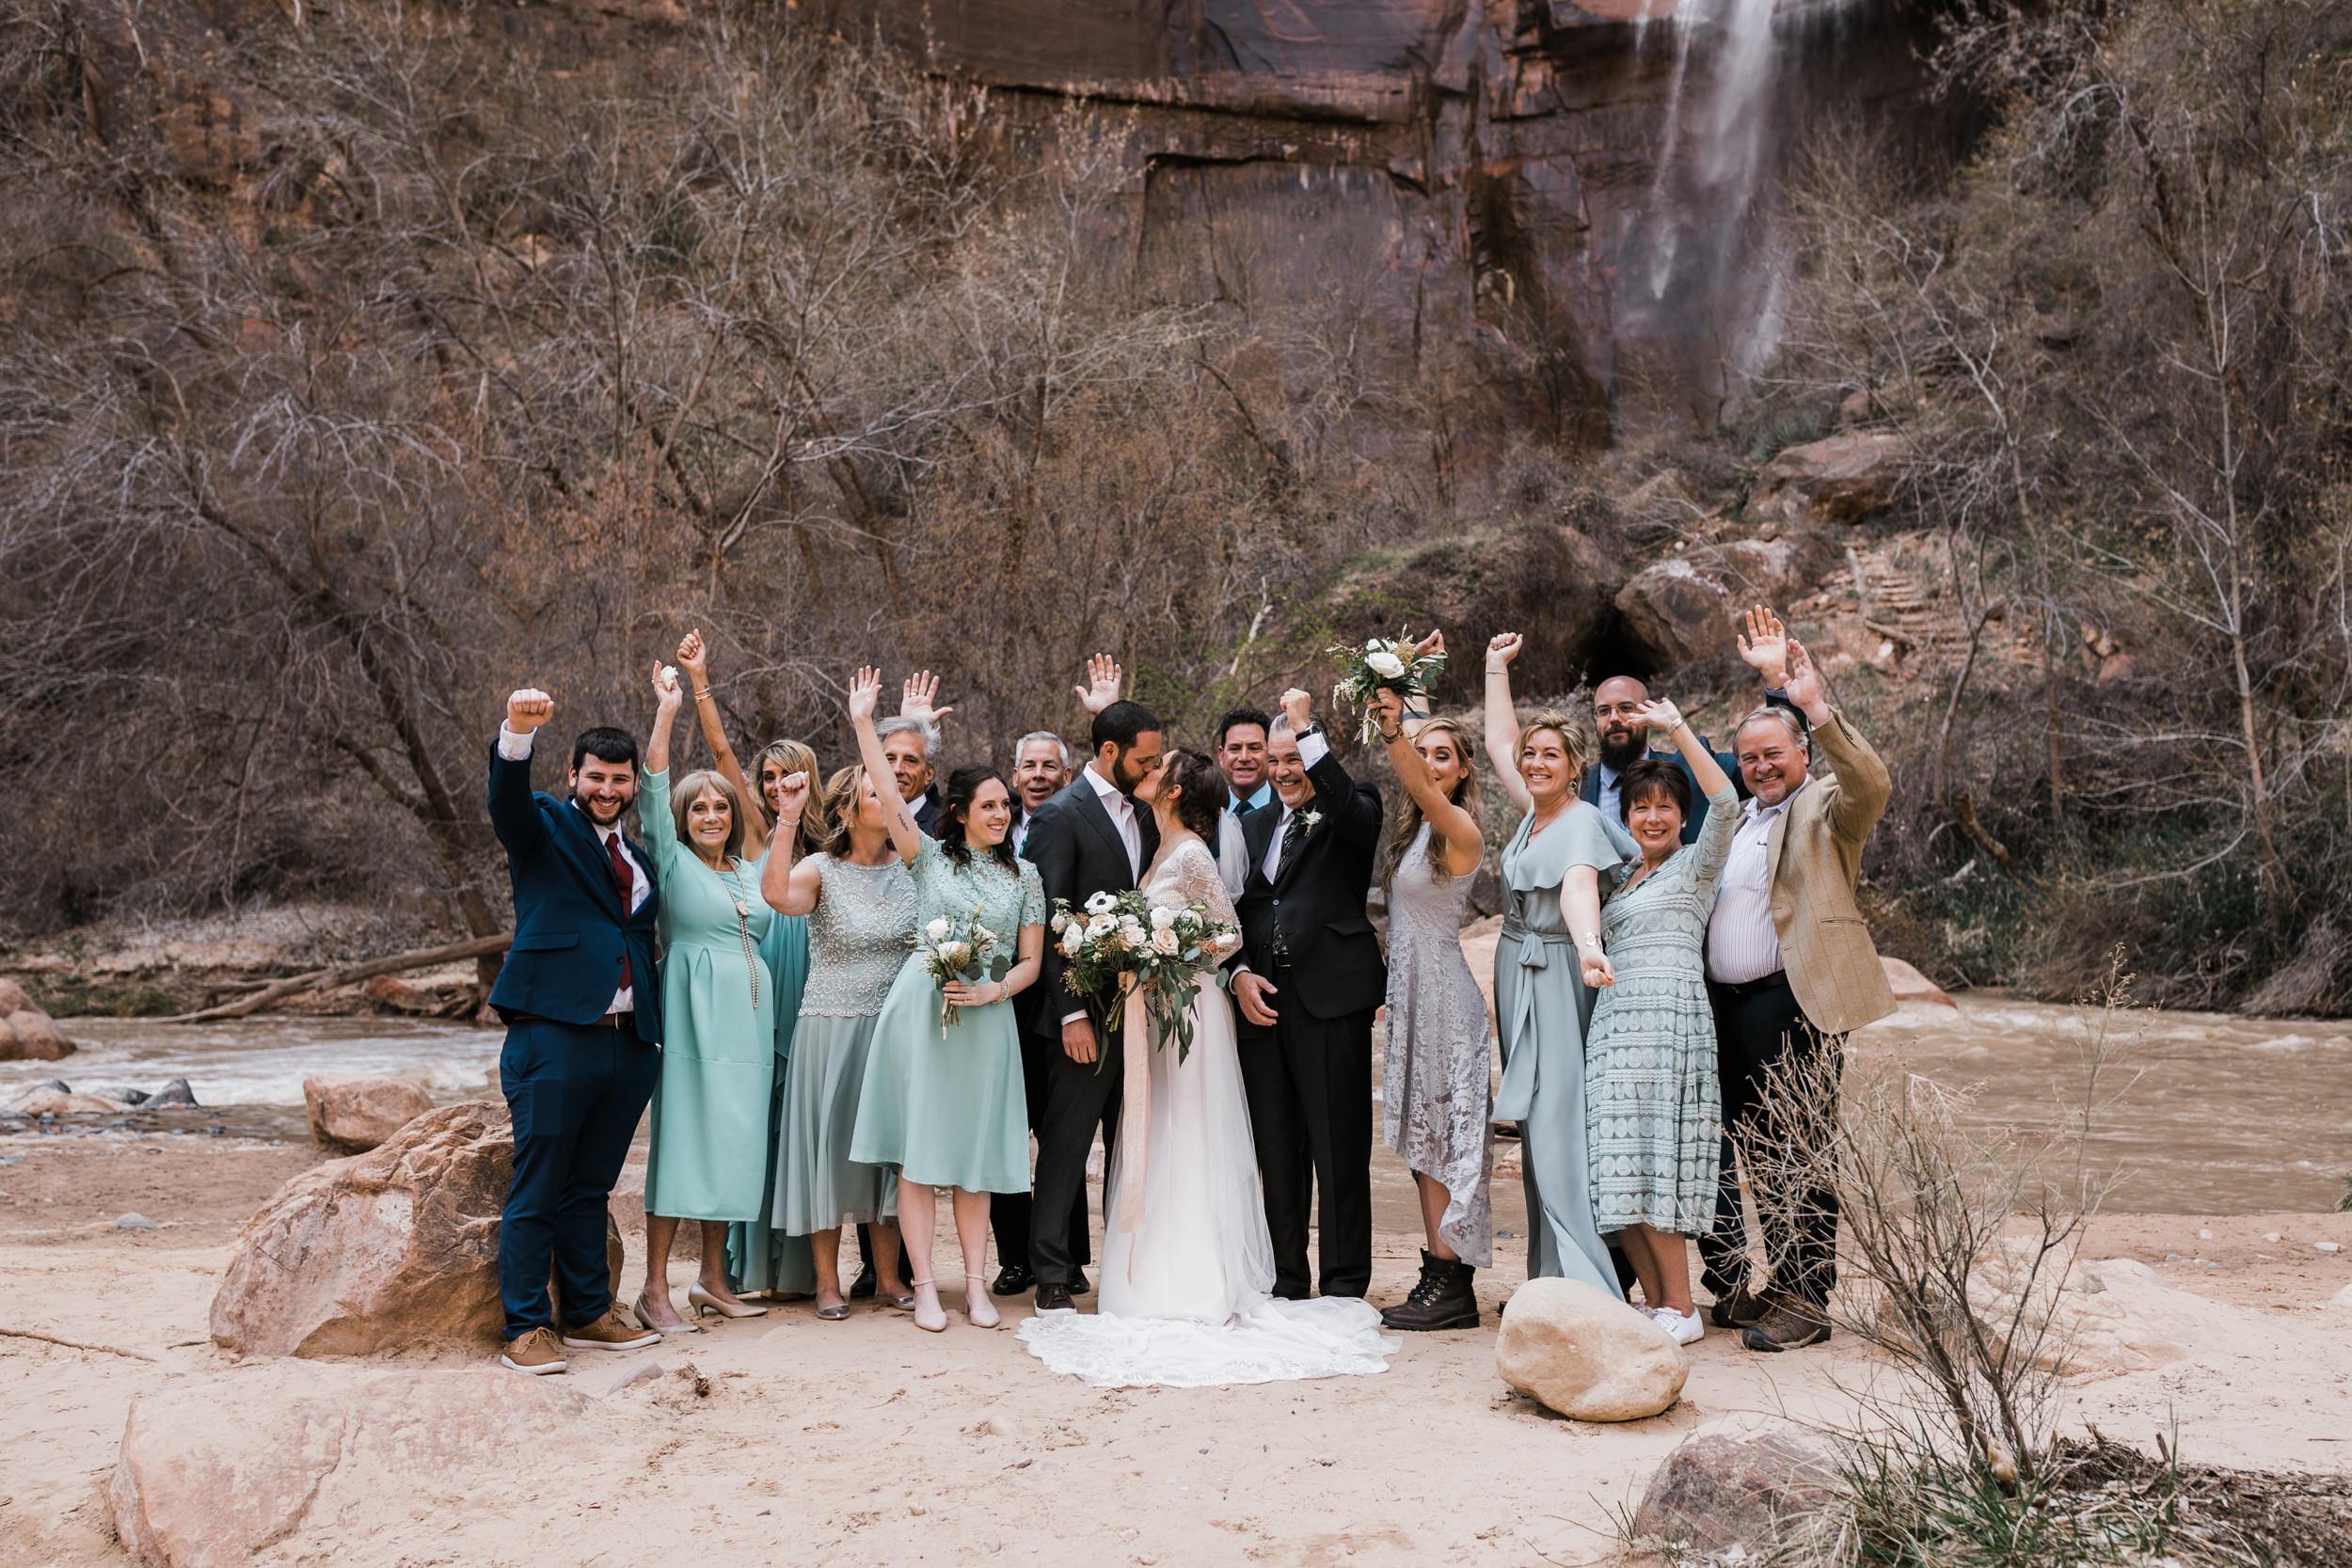 Zion-National-Park-Adventure-Wedding-Hearnes-Elopement-Photography-15.jpg